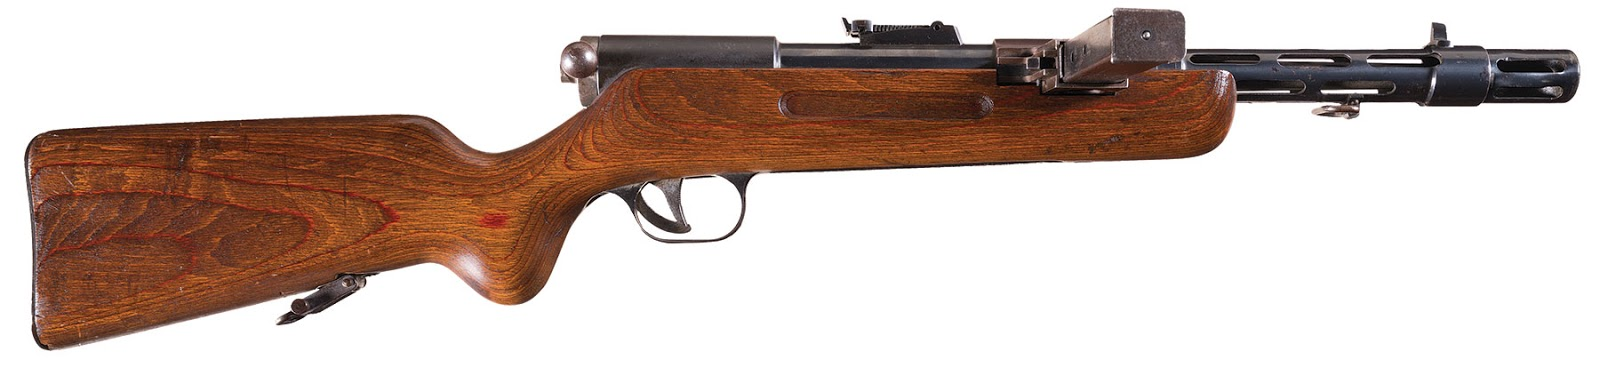 They Make All Kinds Pre World War 2 Designed German Bergman Mp 35 1